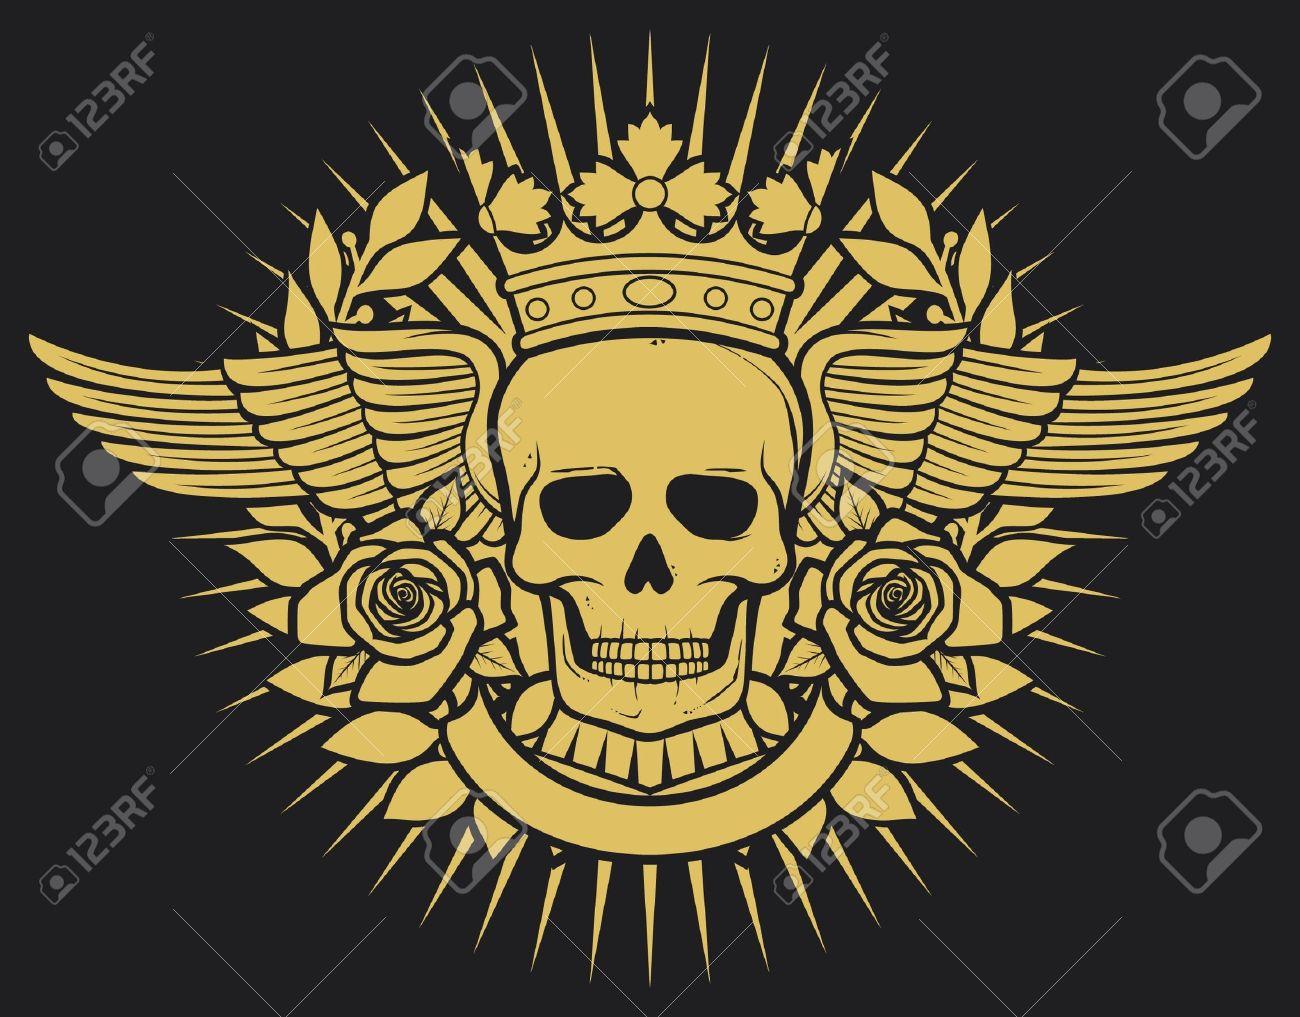 Skull Symbol Skull Tattoo Design Crown Laurel Wreath Wings